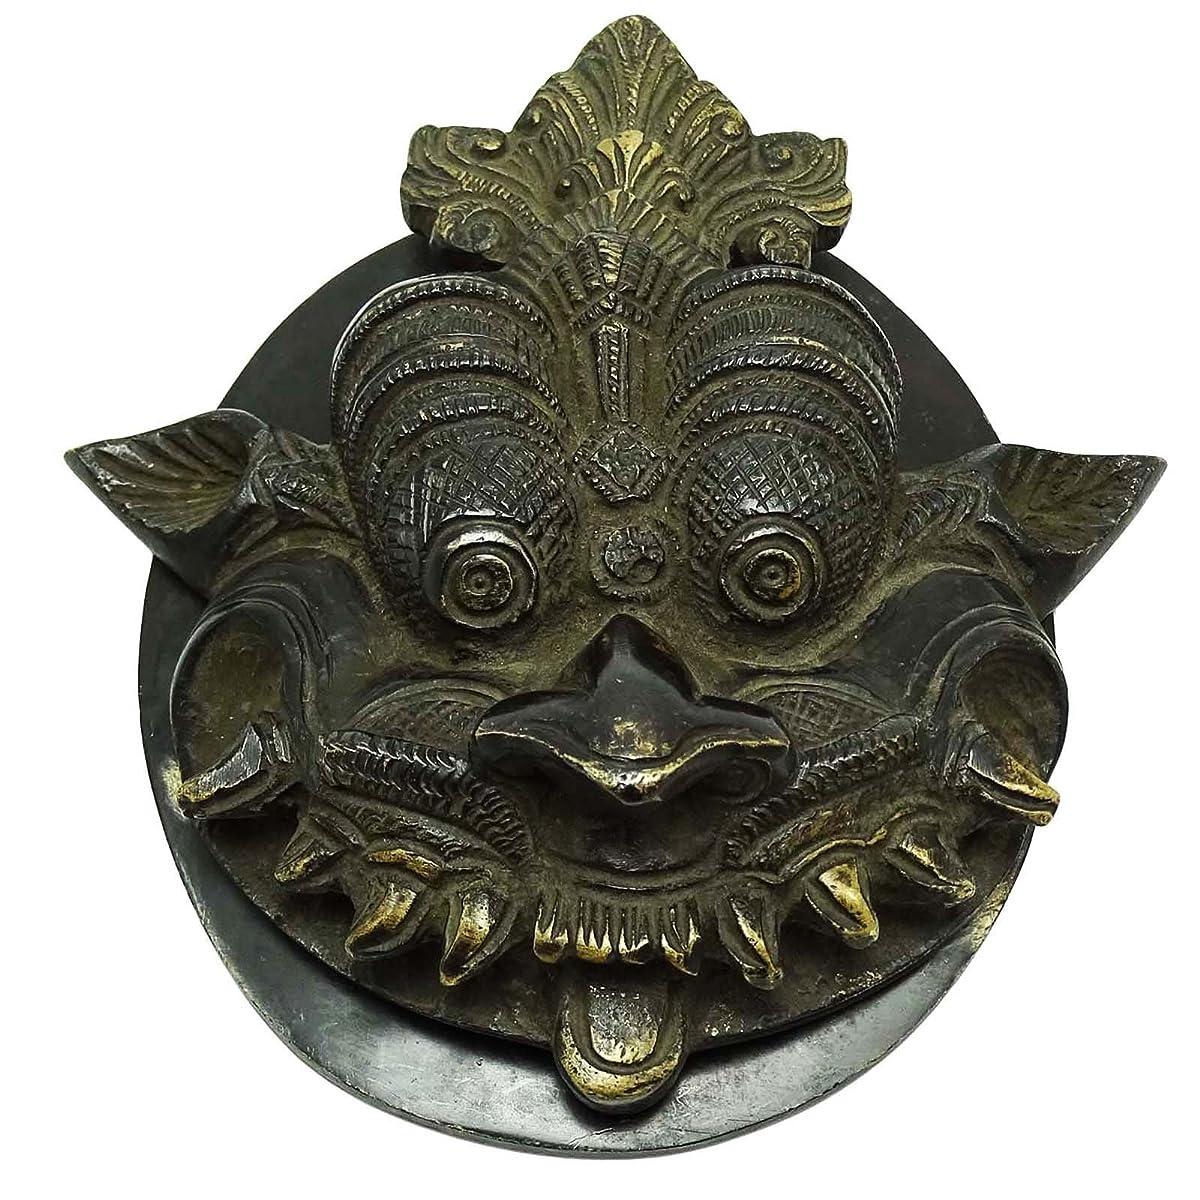 Ethnic Dragon Face Brass Door Knocker Decorative Home Décor Collectibles Gift